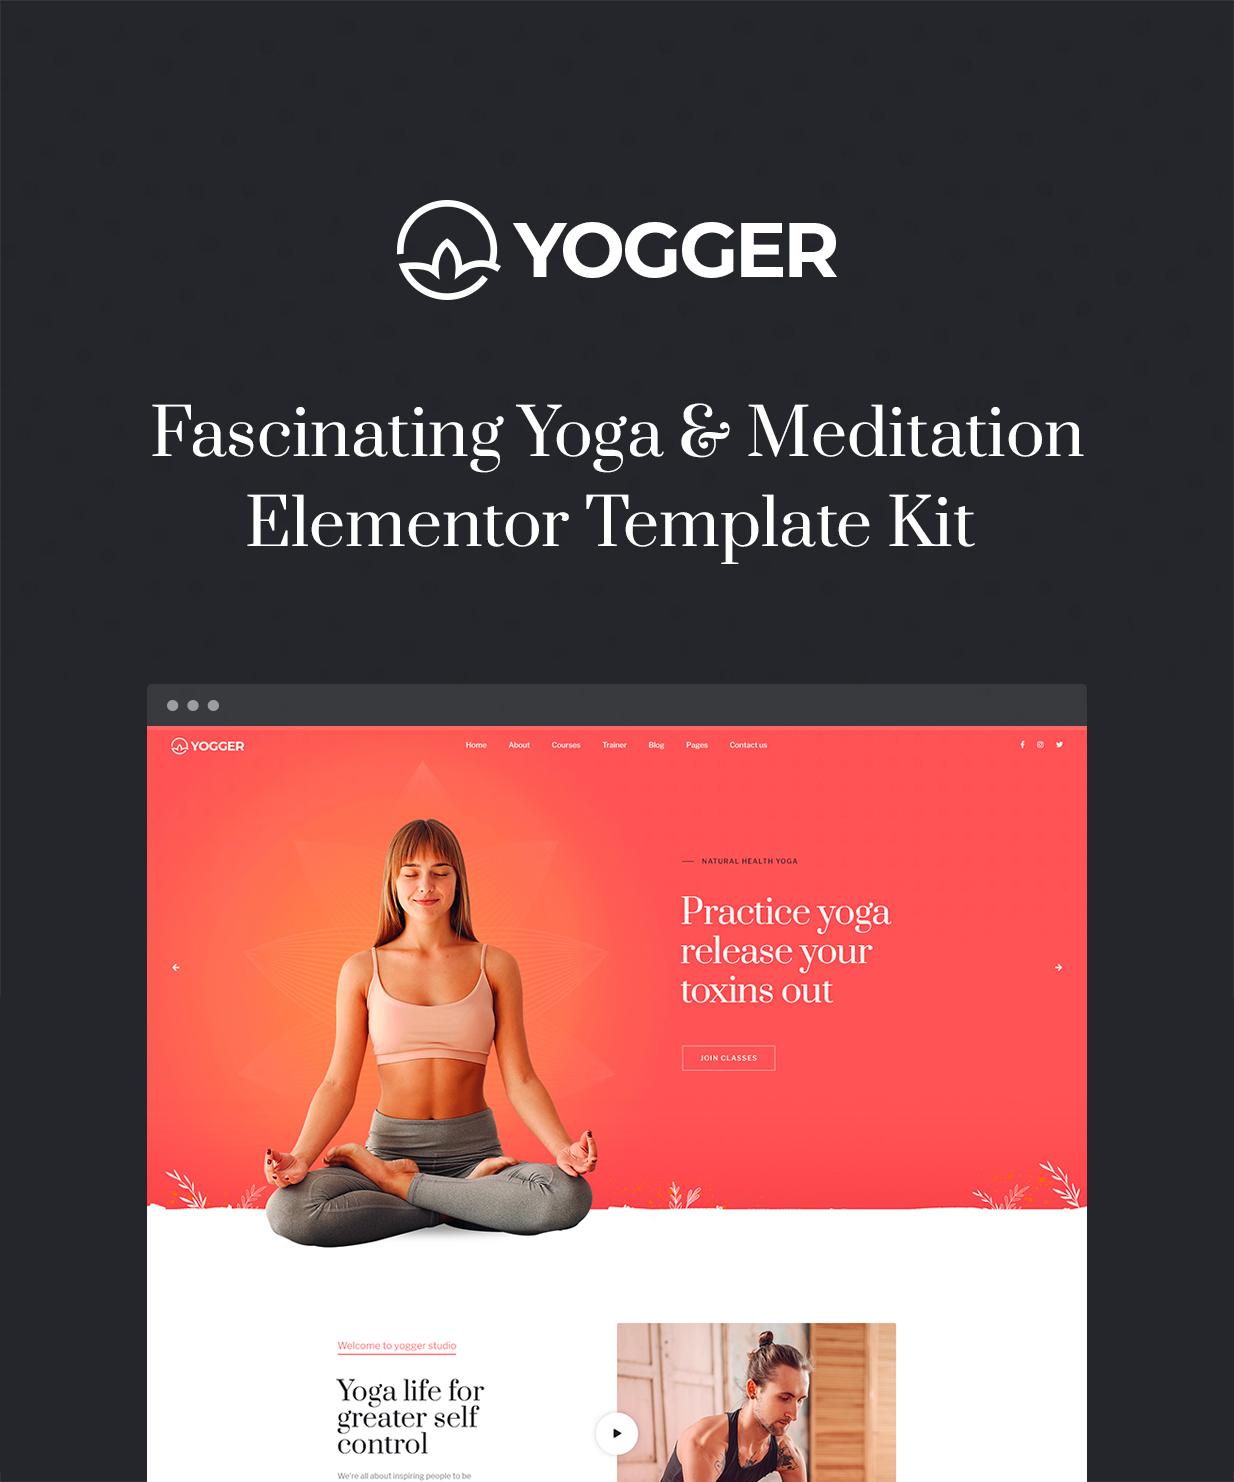 Yogger - Meditation and Yoga Elementor Template Kit